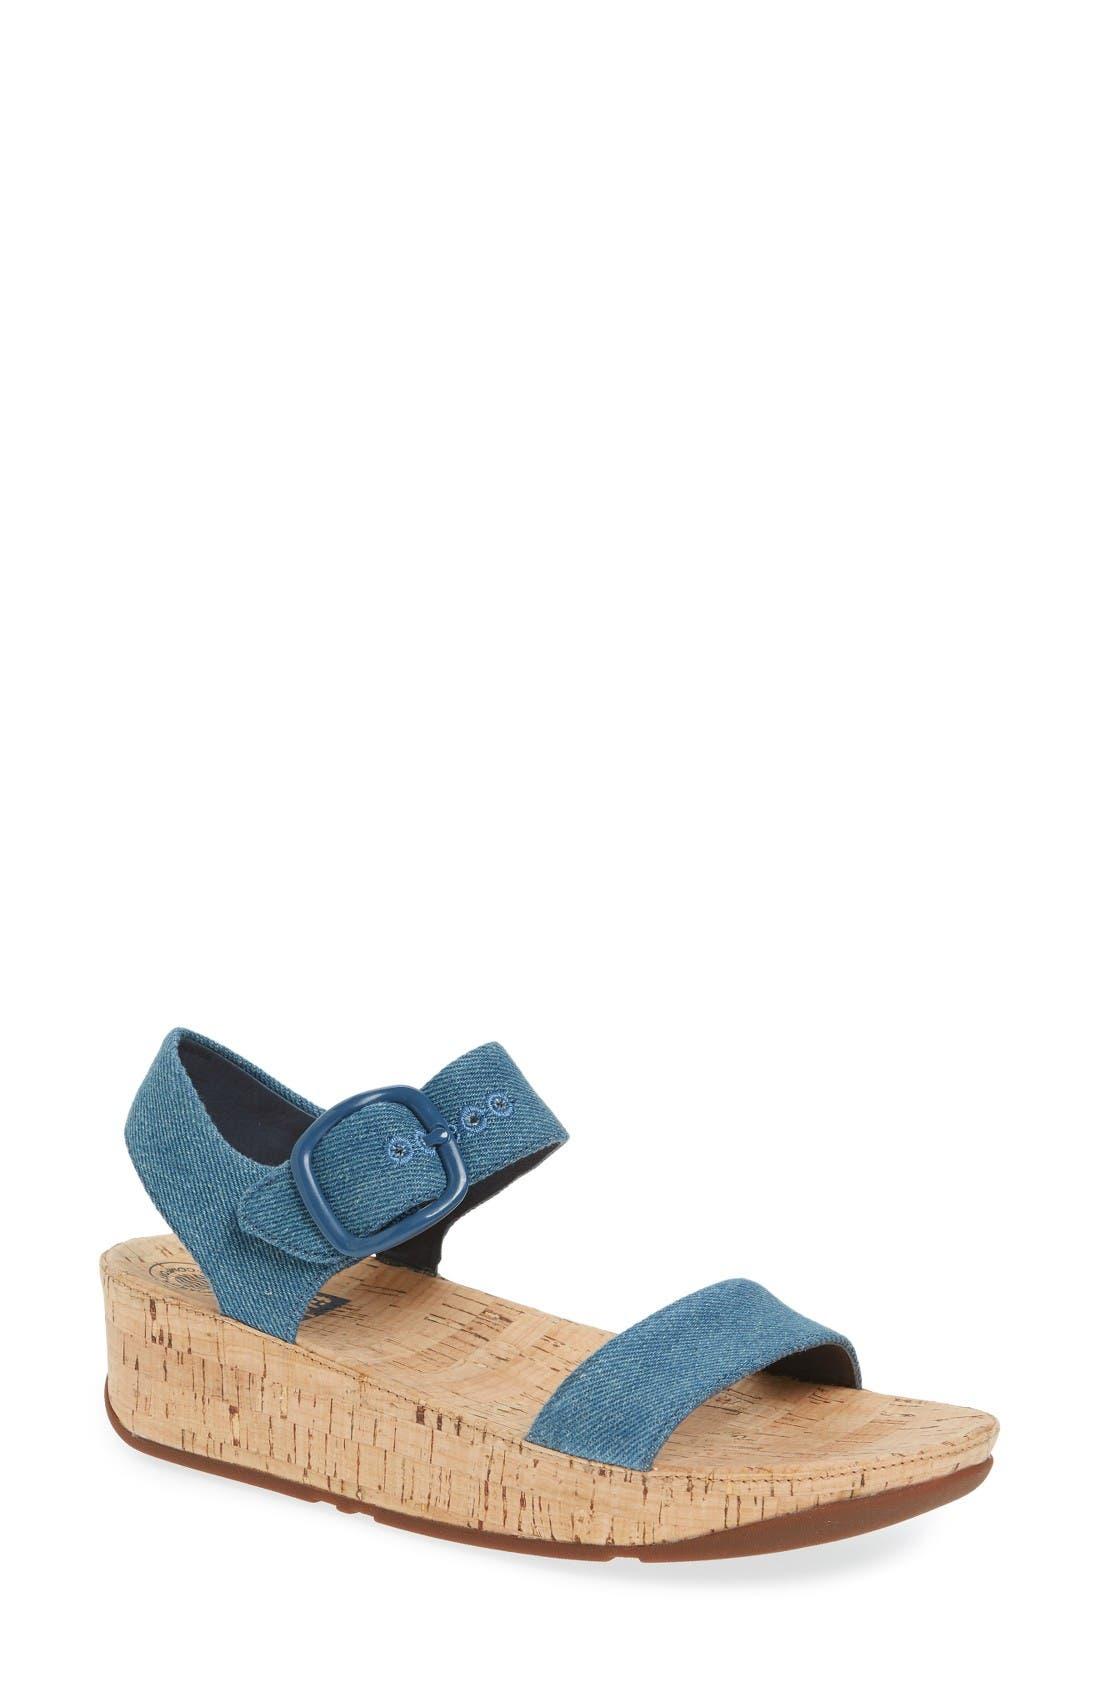 Bon Sandal,                         Main,                         color, Denim Fabric